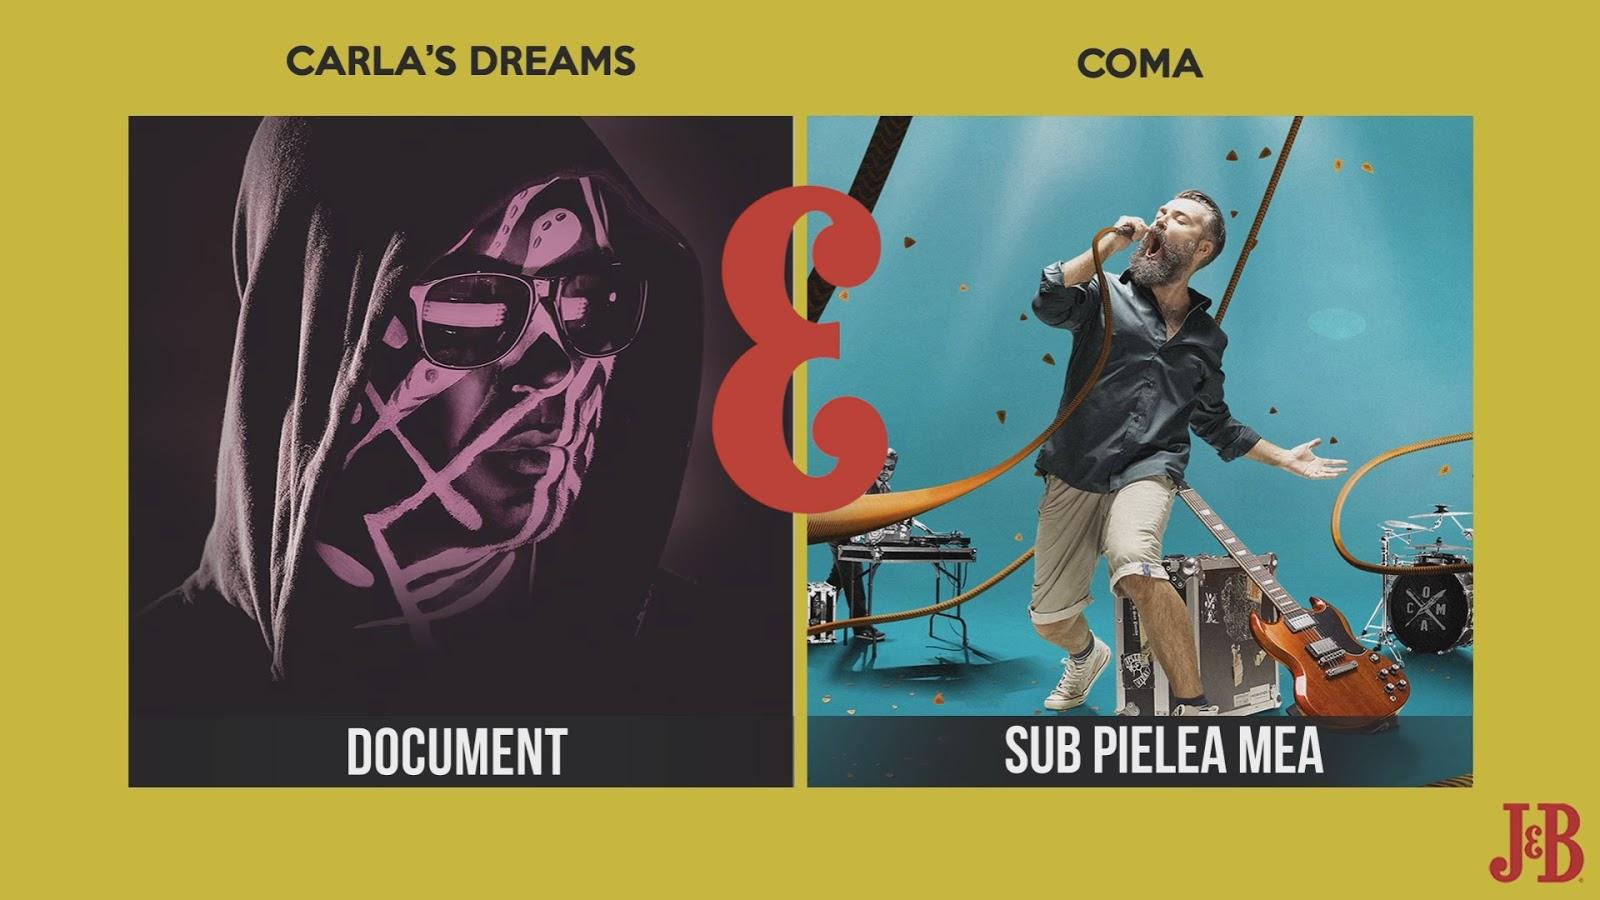 Blending Spirits by J&B - Coma vs. Carlas Dreams